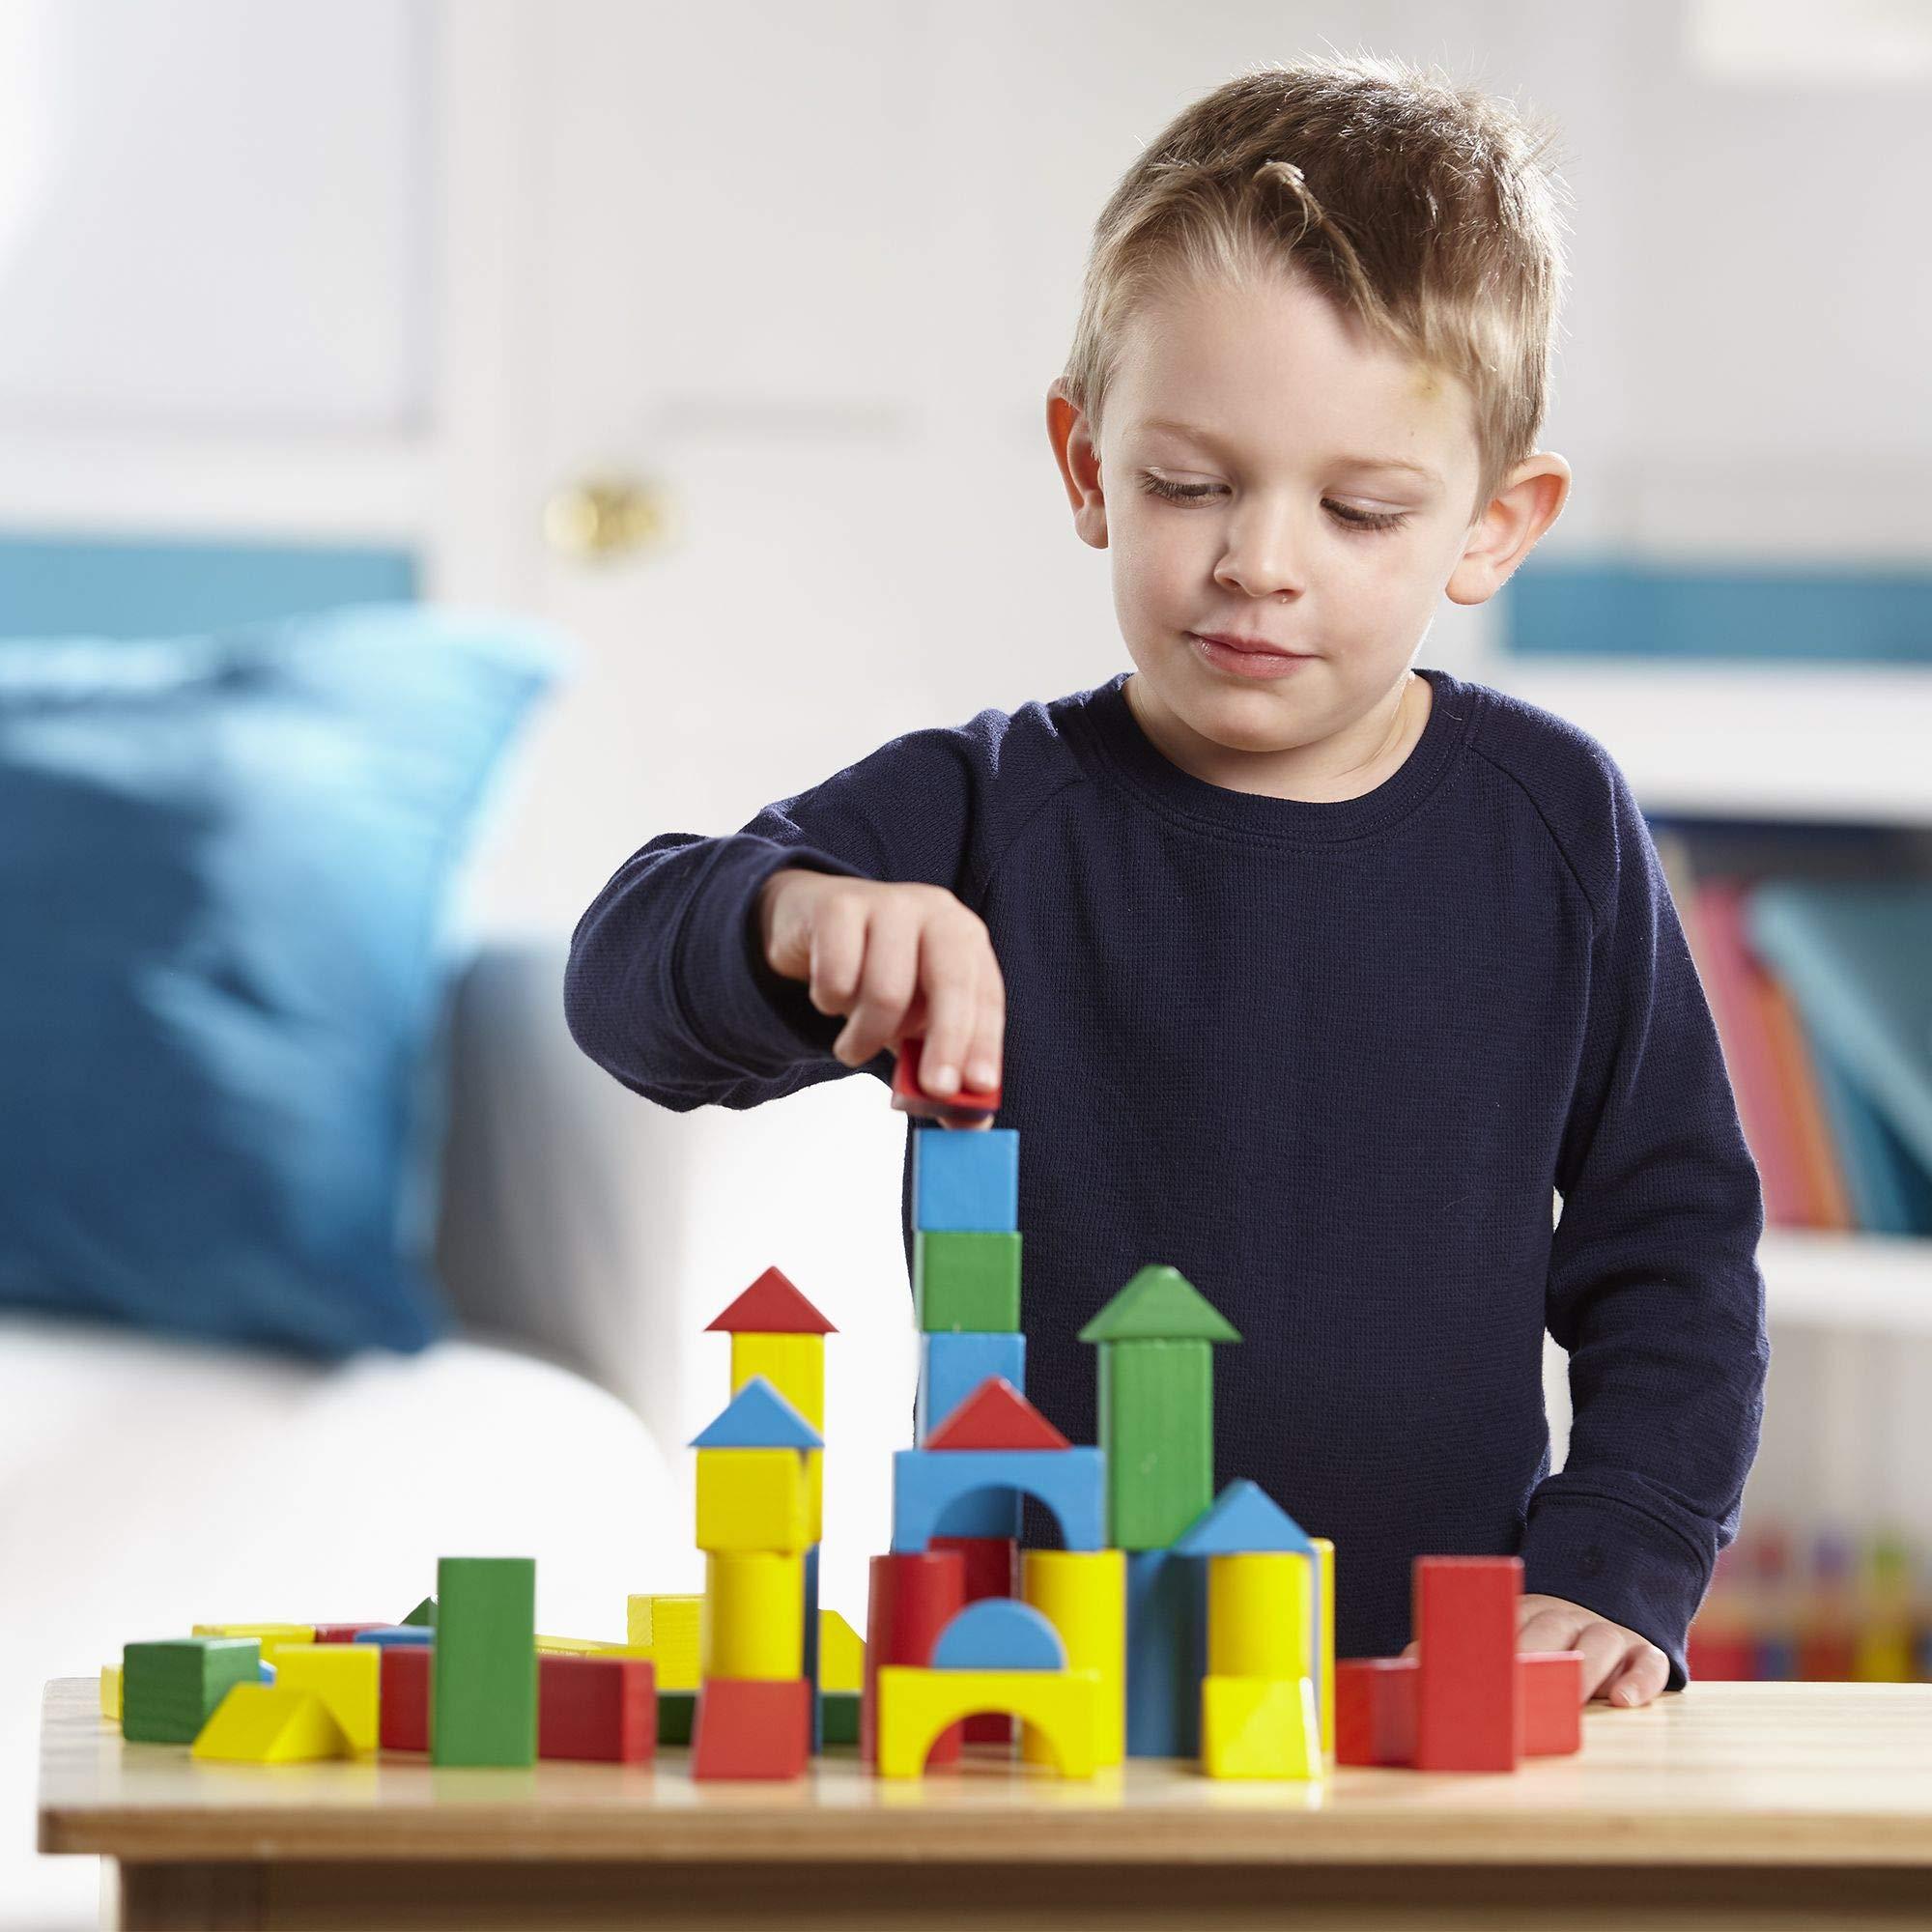 Buy Melissa Doug Building Blocks Now!